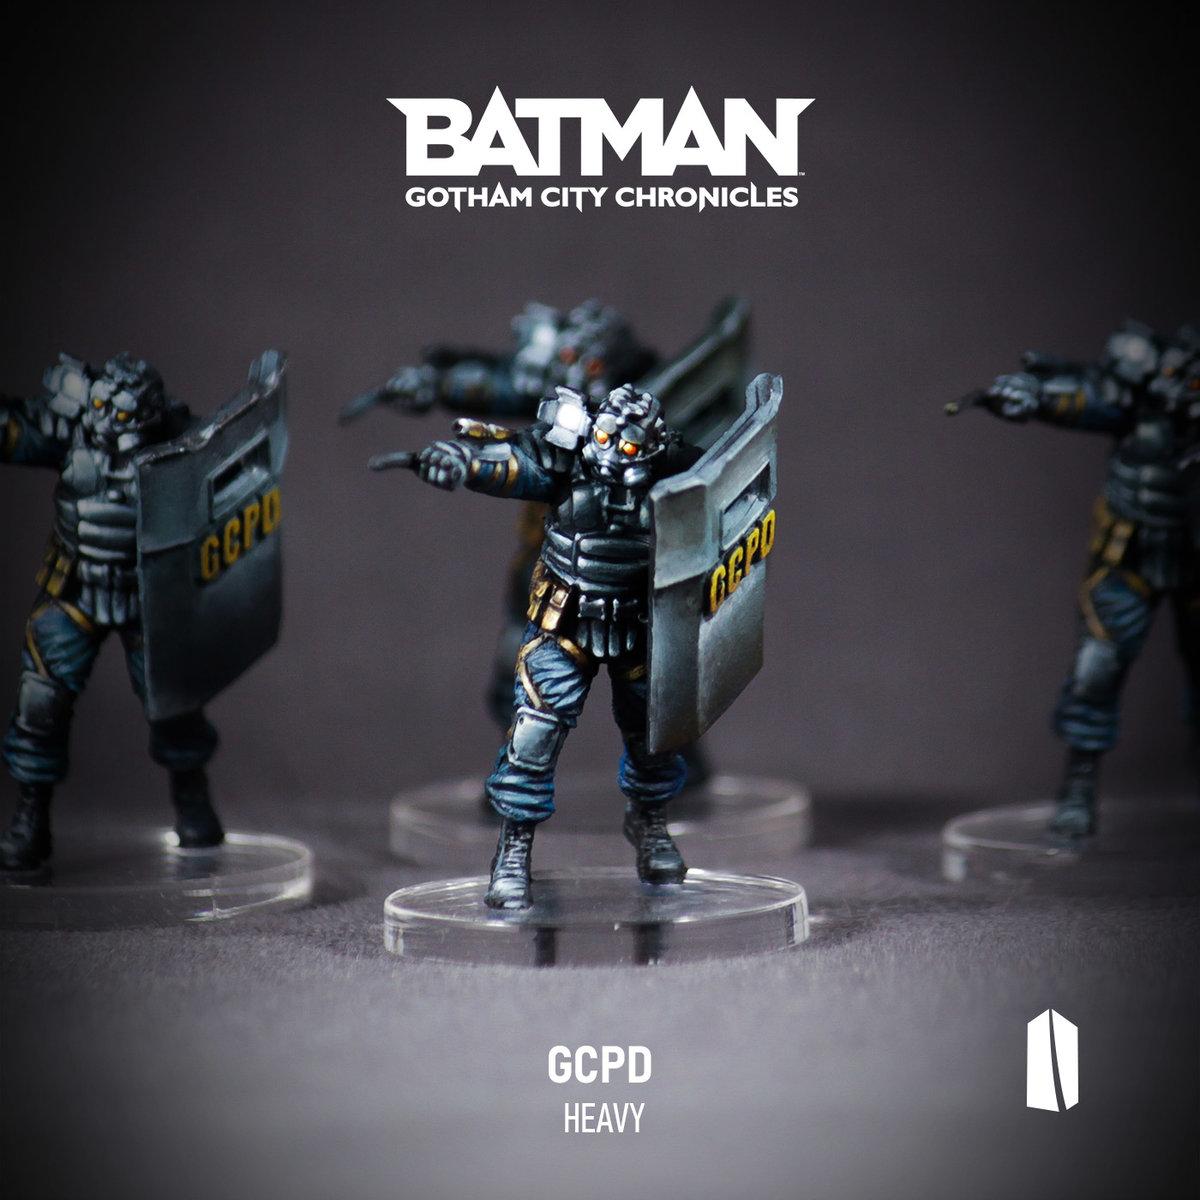 batmanGCC_GCPD_heavy_final.jpg